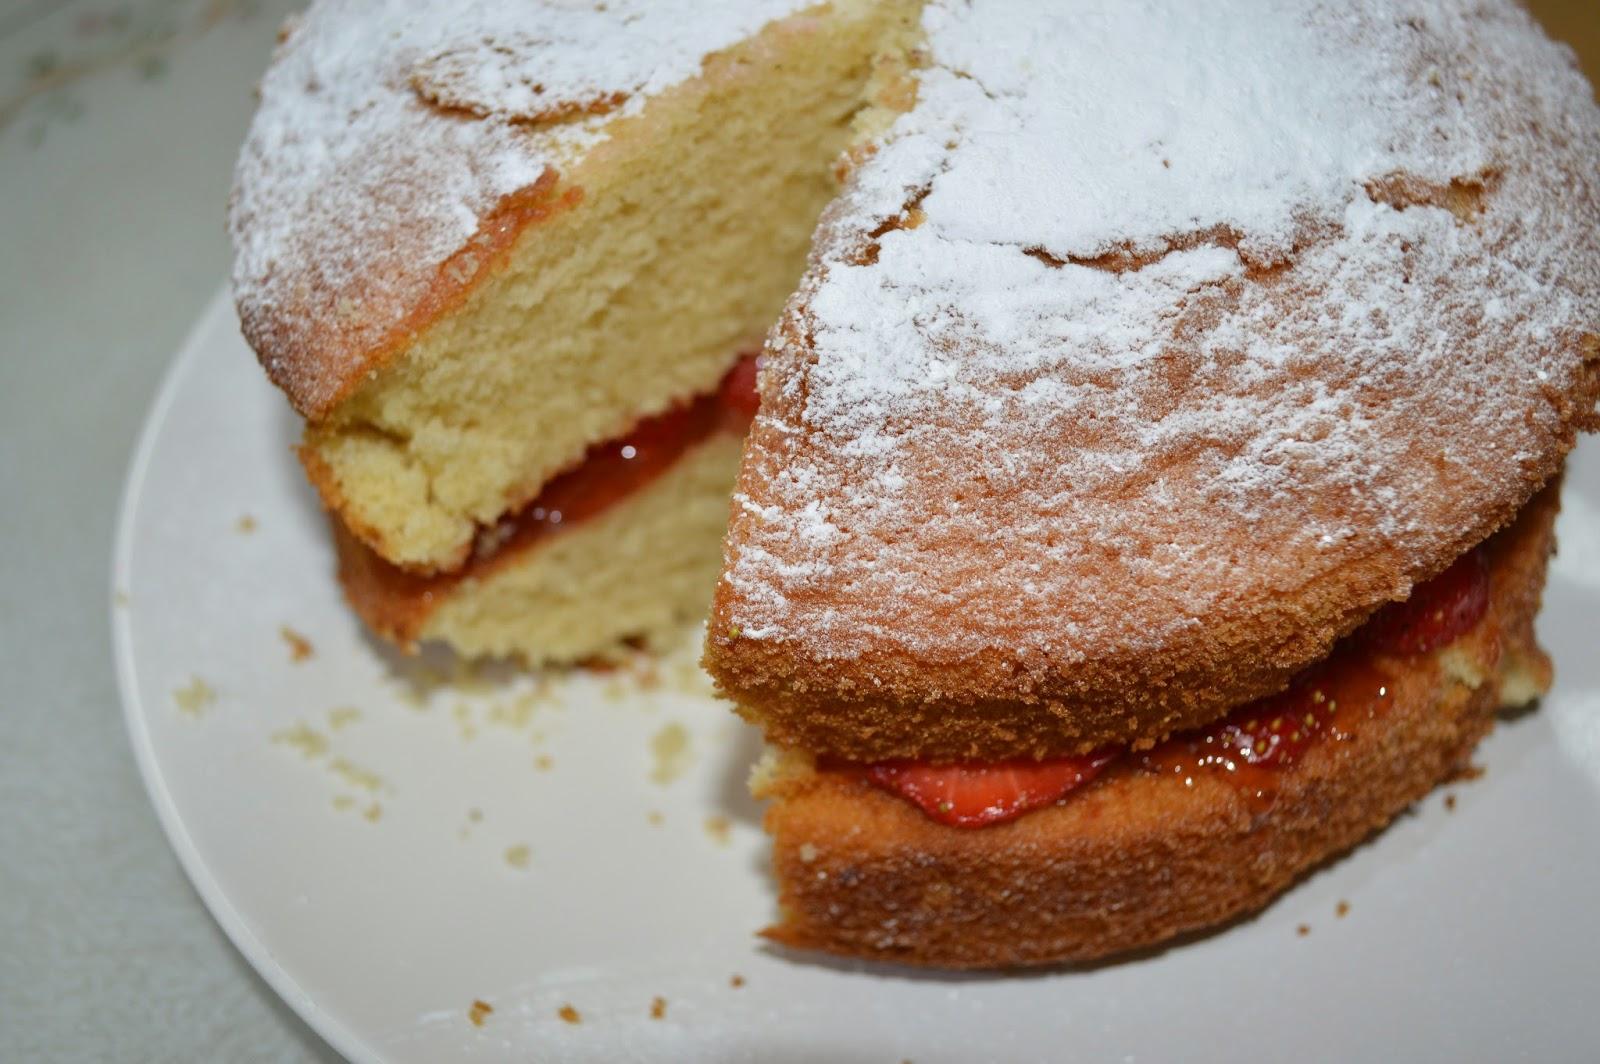 Victoria Sponge, cake, classic, easy, simple, gluten-free, no wheat, celiac, coeliac, rice flour, desert, pudding, UK, recipe, ingredients